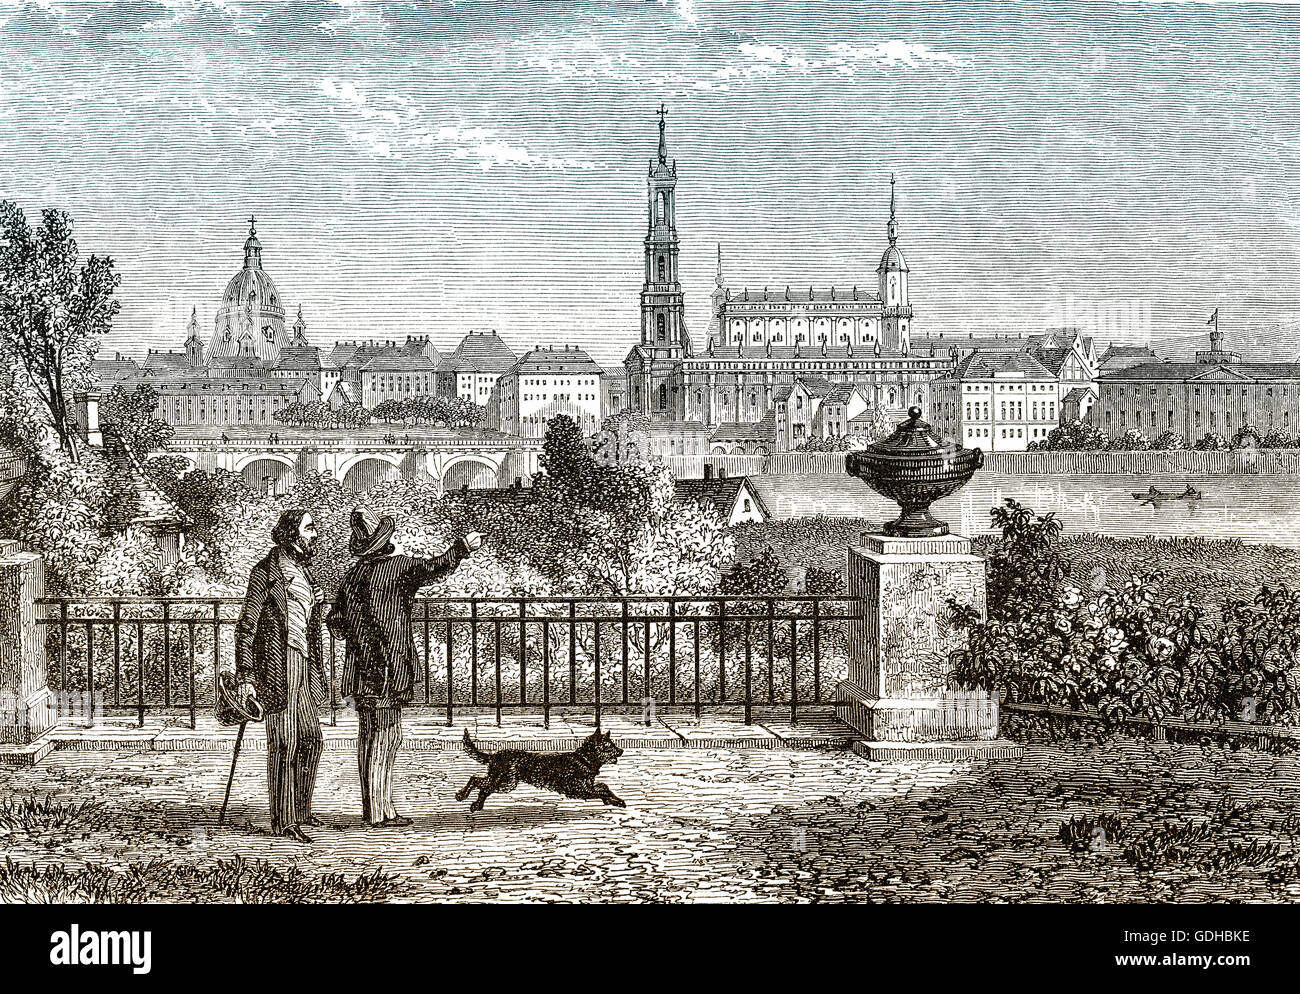 Historical cityscape of Dresden, 18th century, Saxony, Germany, Europe, Stock Photo